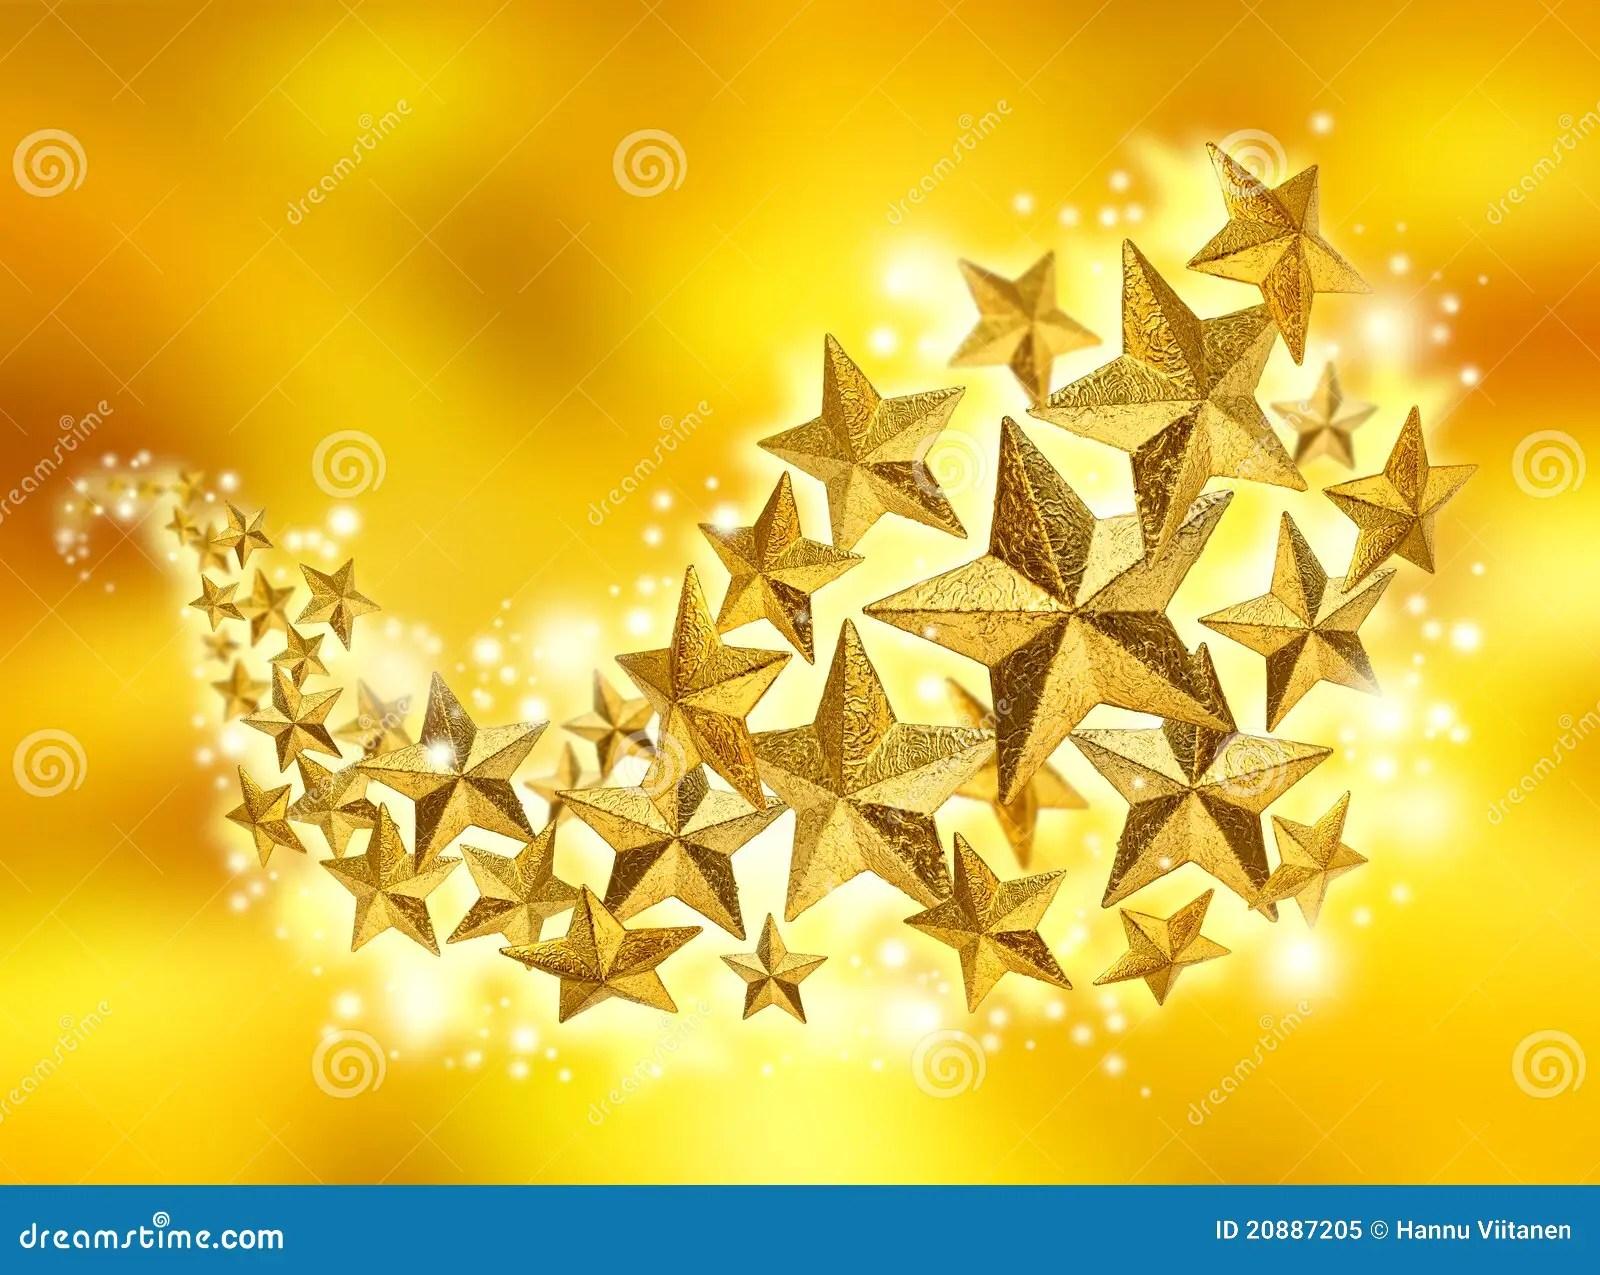 Merry Christmas Desktop Wallpaper 3d Golden Stars Celebration Flow Royalty Free Stock Photo